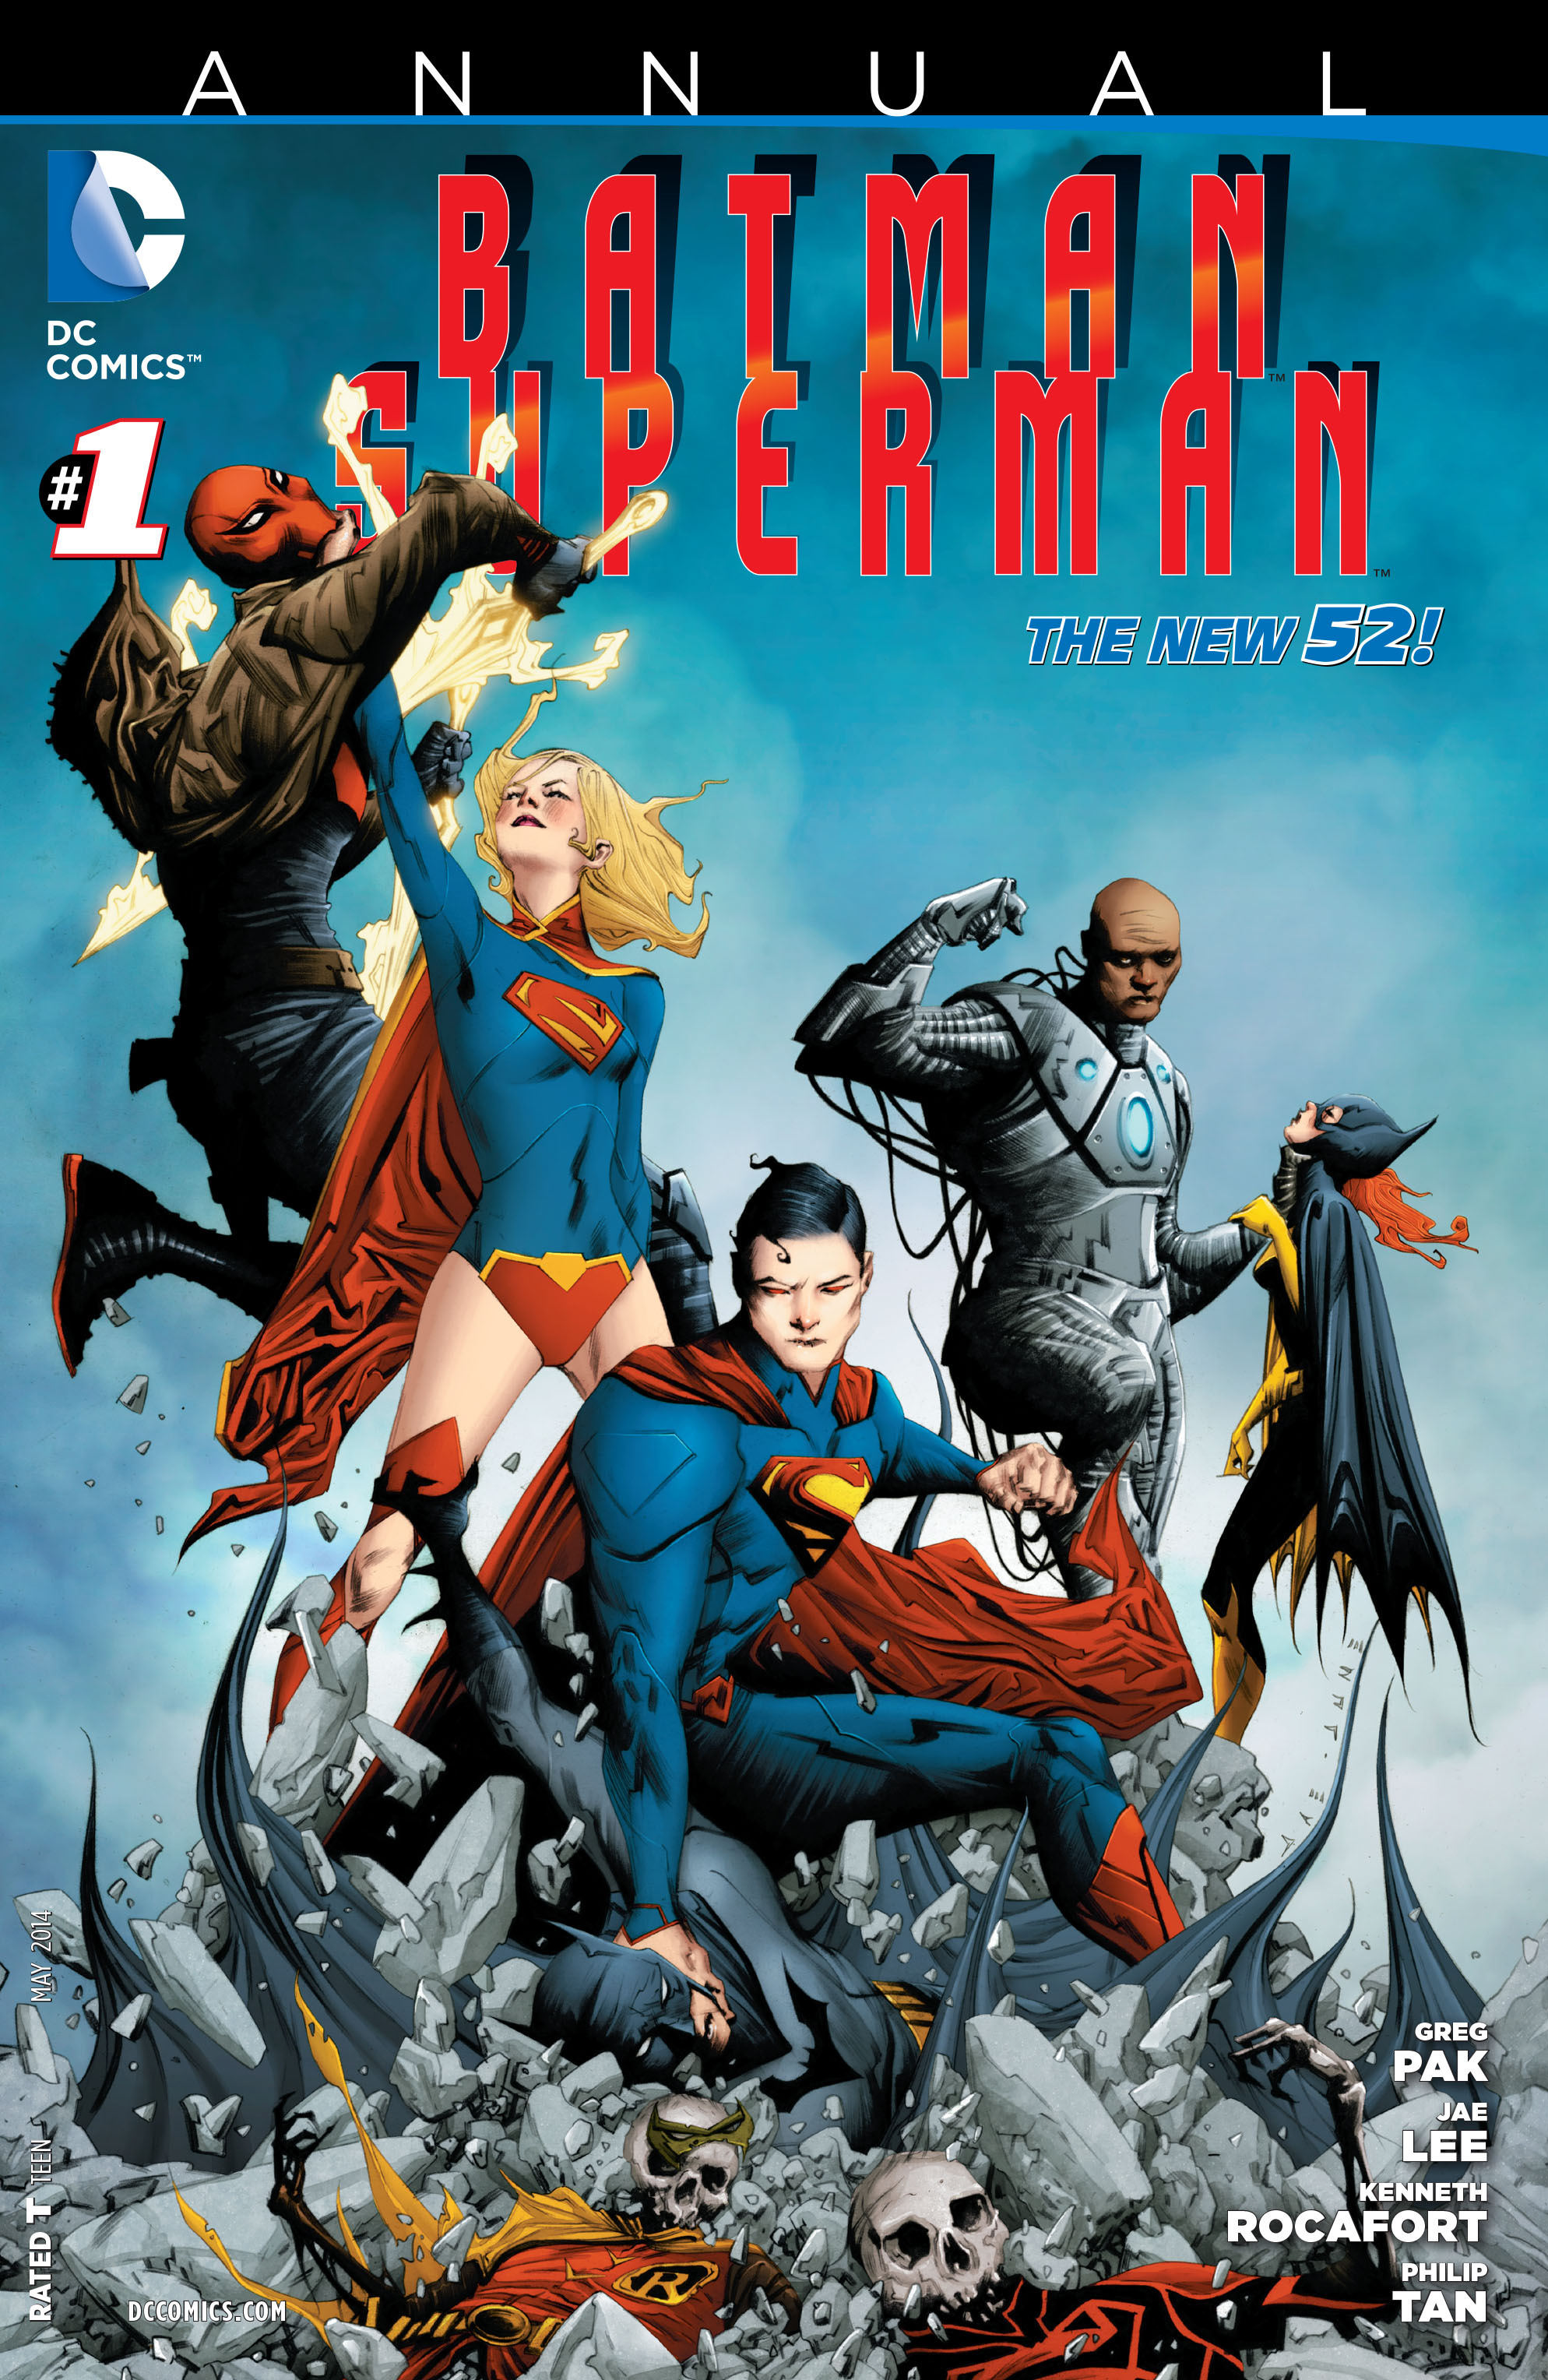 DC Comics BATMAN #1 Rebirth Jae LEE DF Variant NM JOKER HARLEY GOTHAM CATWOMAN